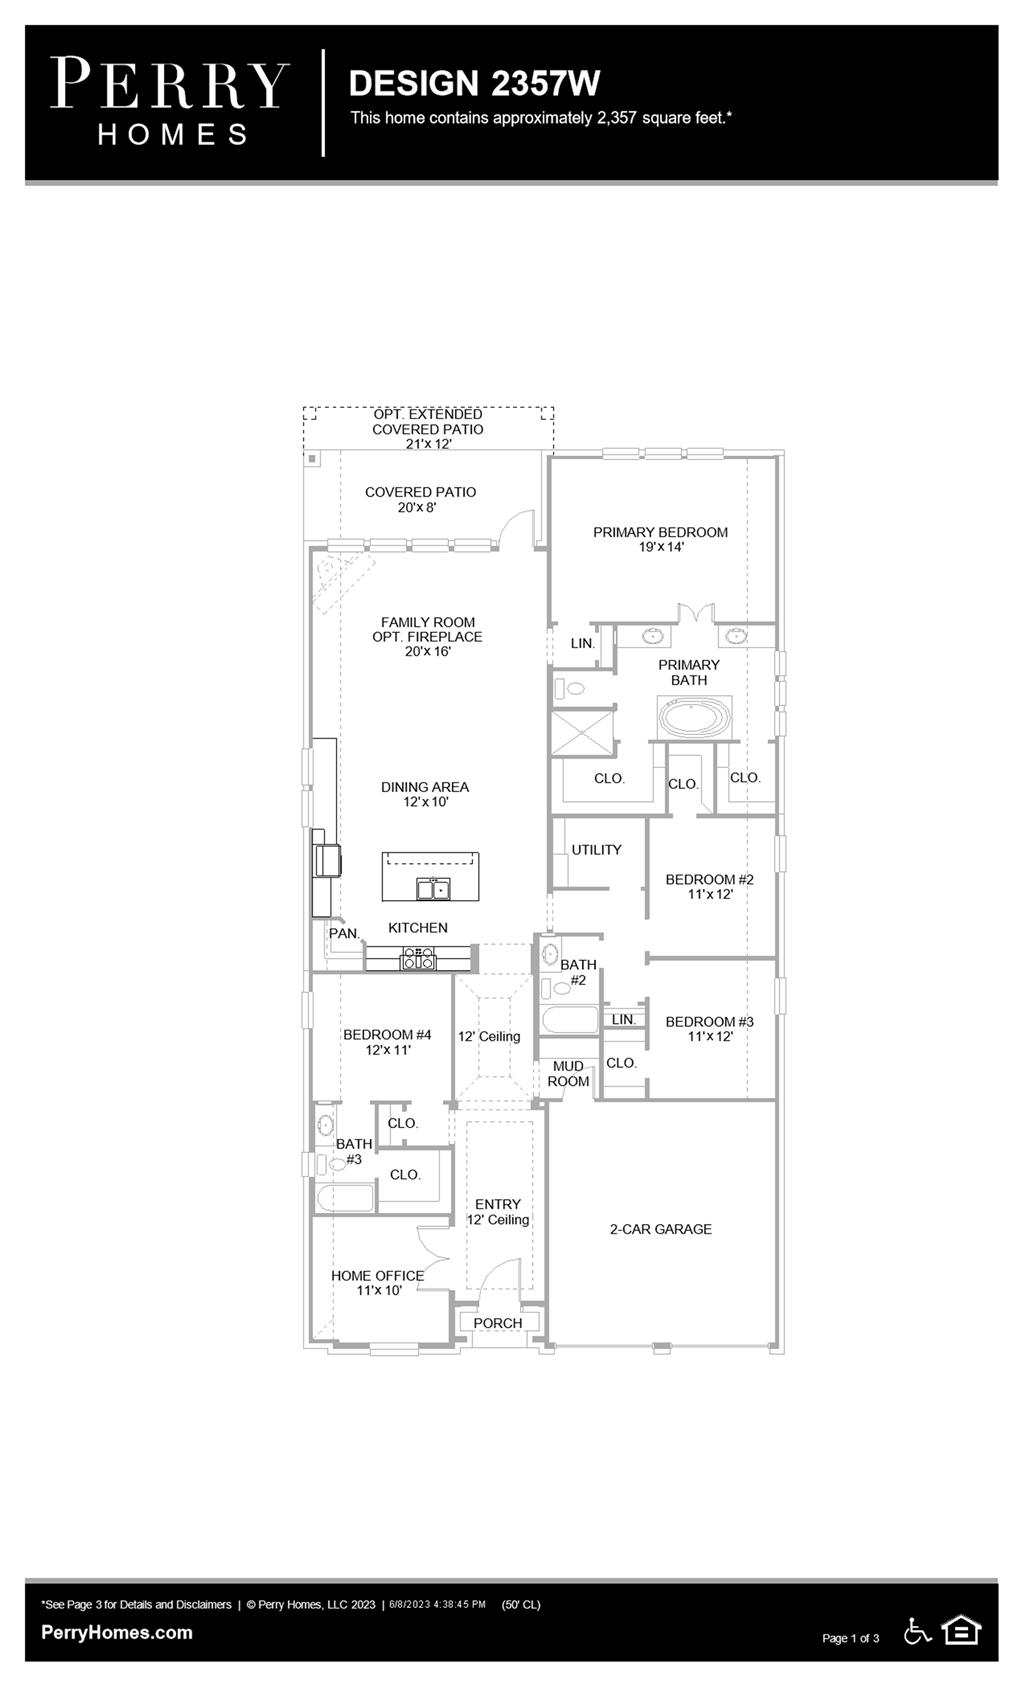 Floor Plan for 2357W